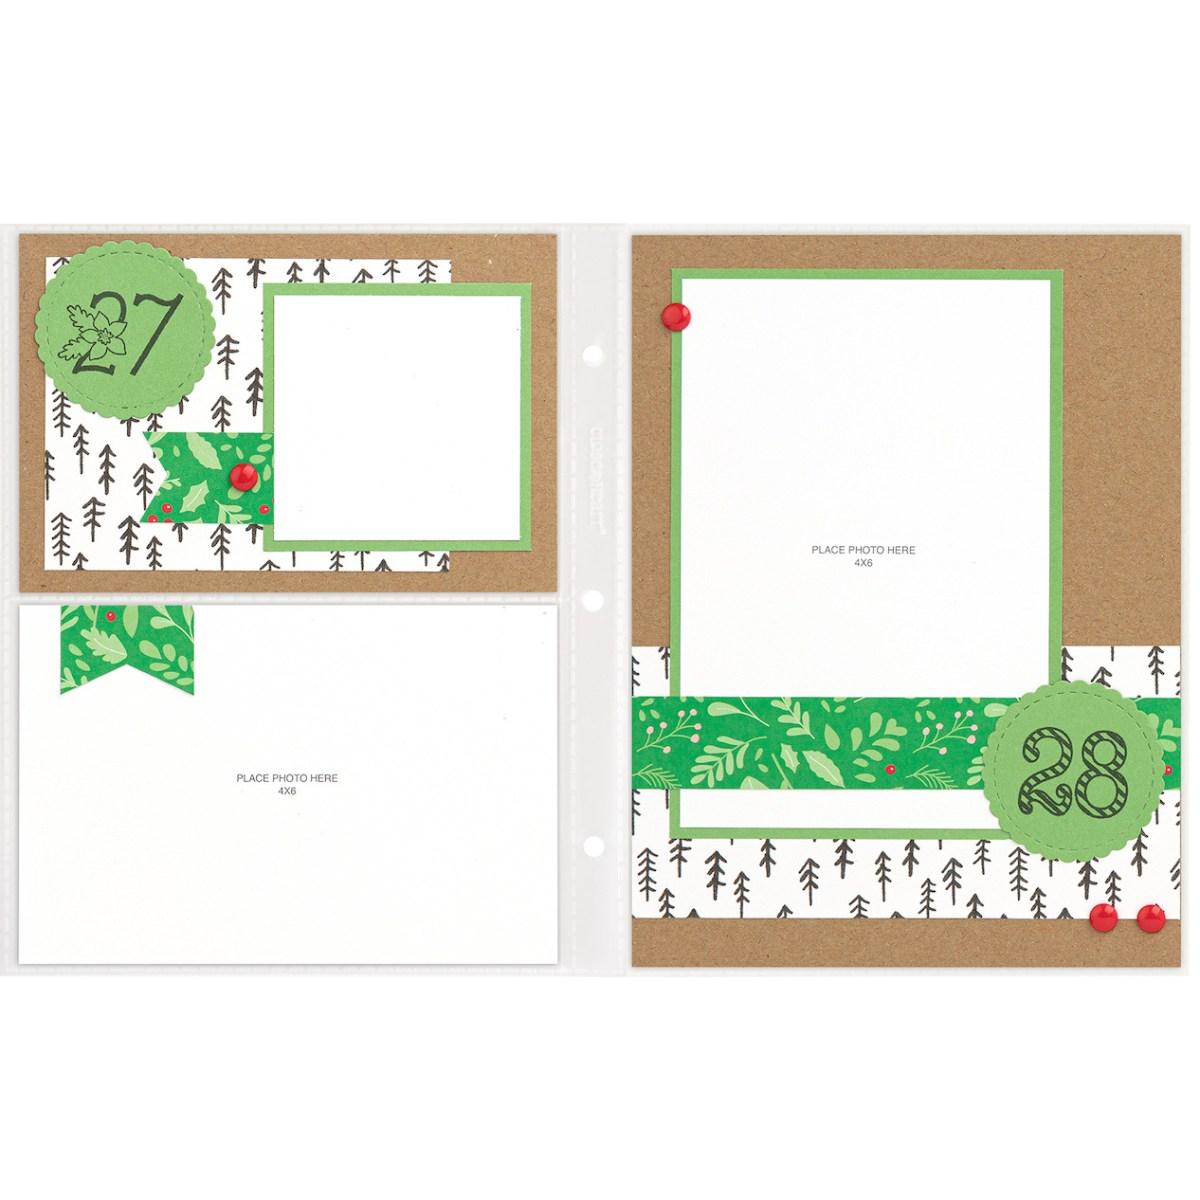 Days of December #closetomyheart #ctmh #ctmhhollyjolly #daysofdecember #photoaday #decemberdaily #christmas #christmasalbum #holidayscrapbook #christmasscrapbook #scrapbooking #memorykeeping #photoprompts